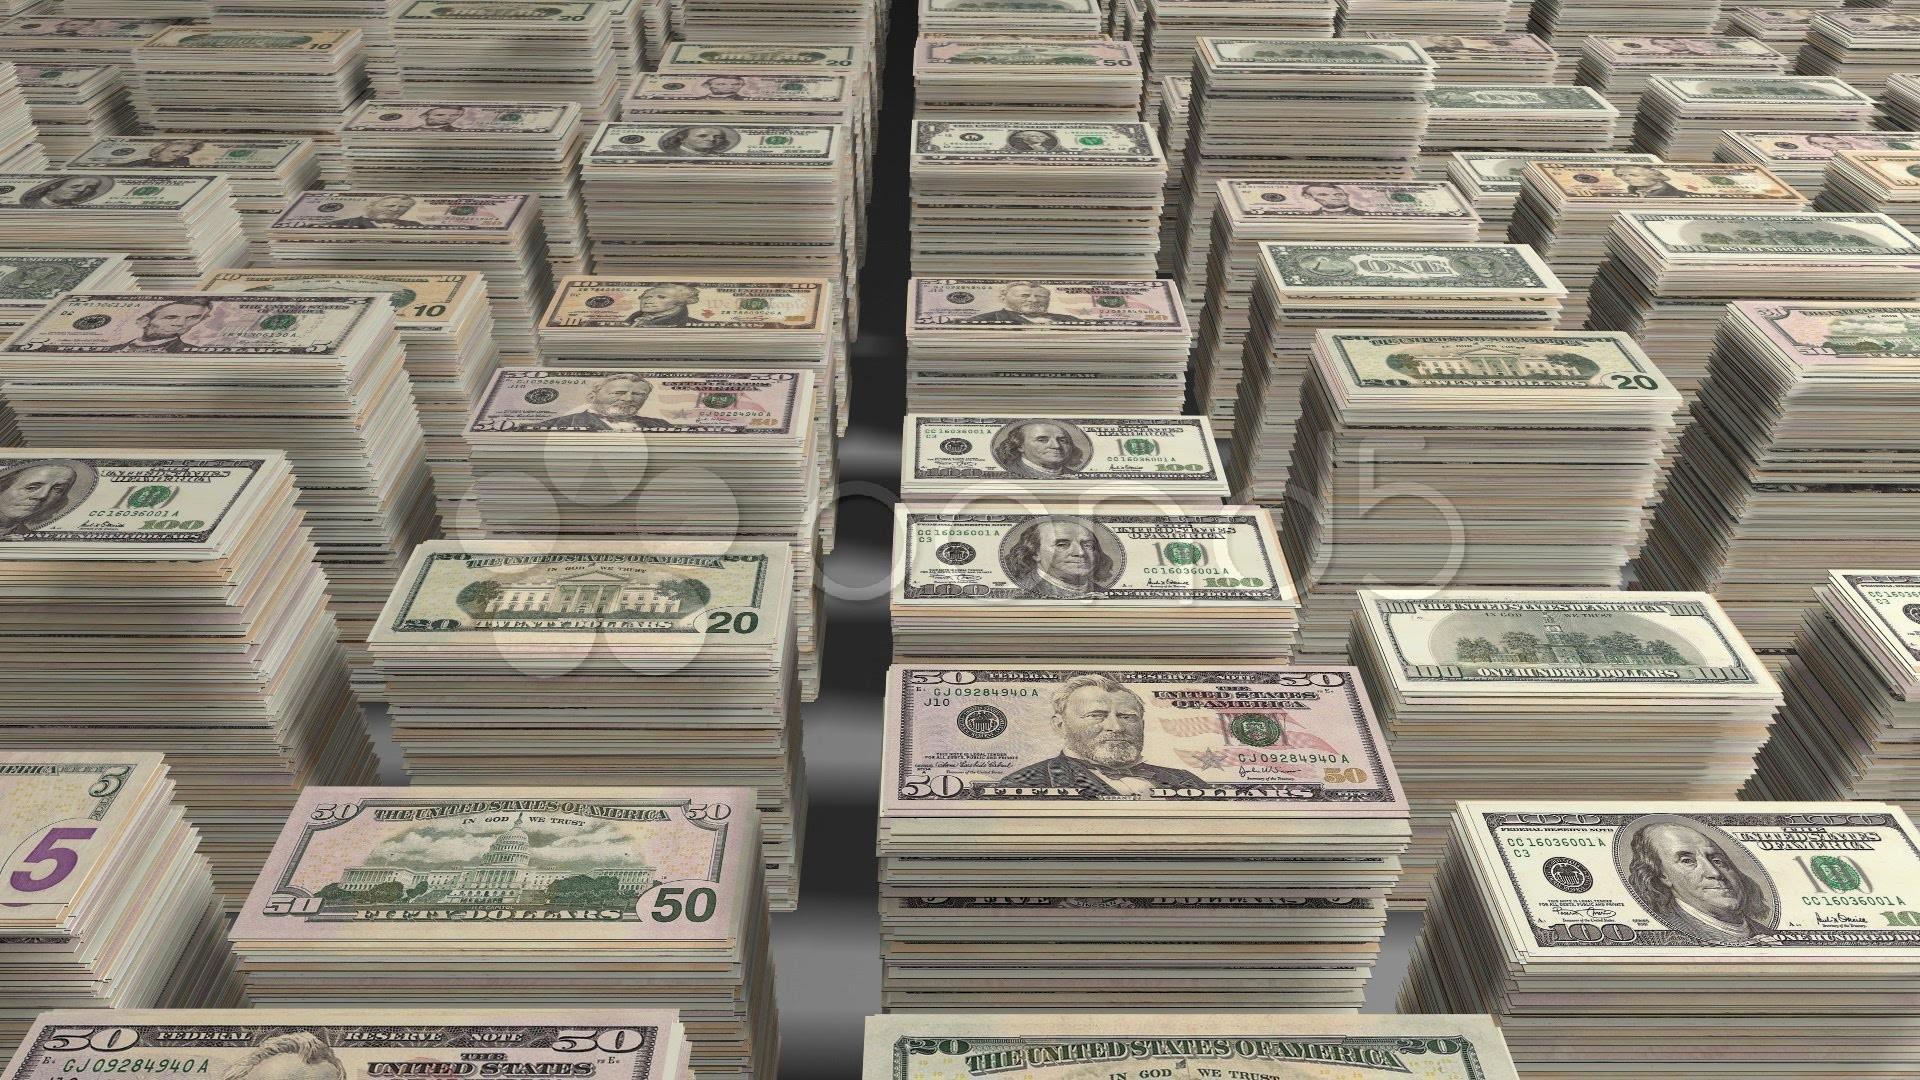 1920x1080 Money Stacks Wallpaper Hd